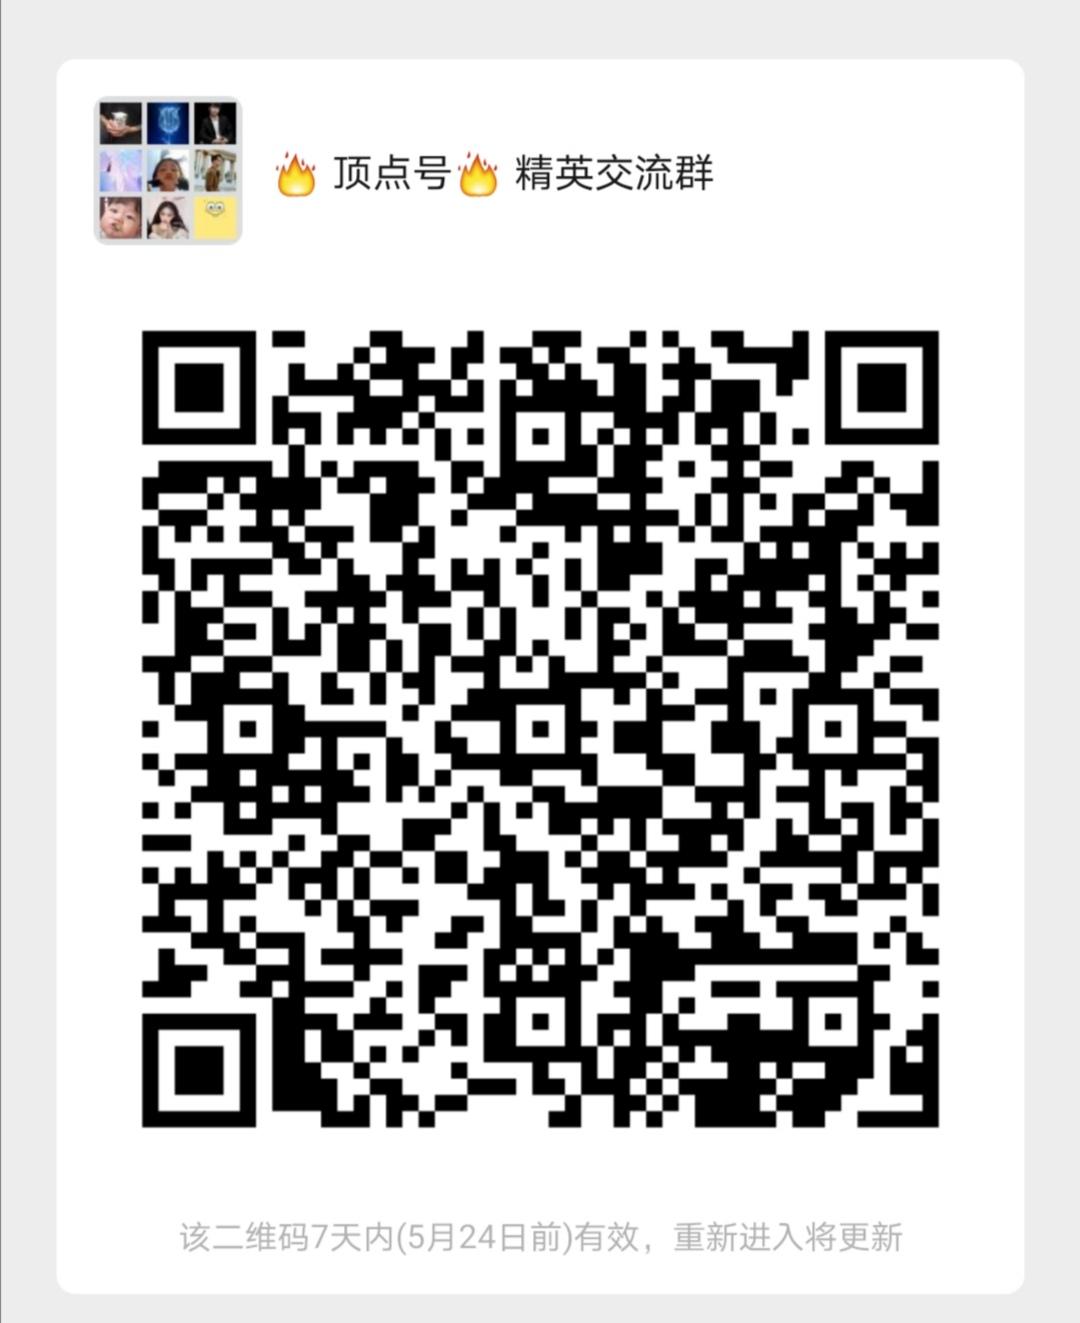 Screenshot_20200517_192845